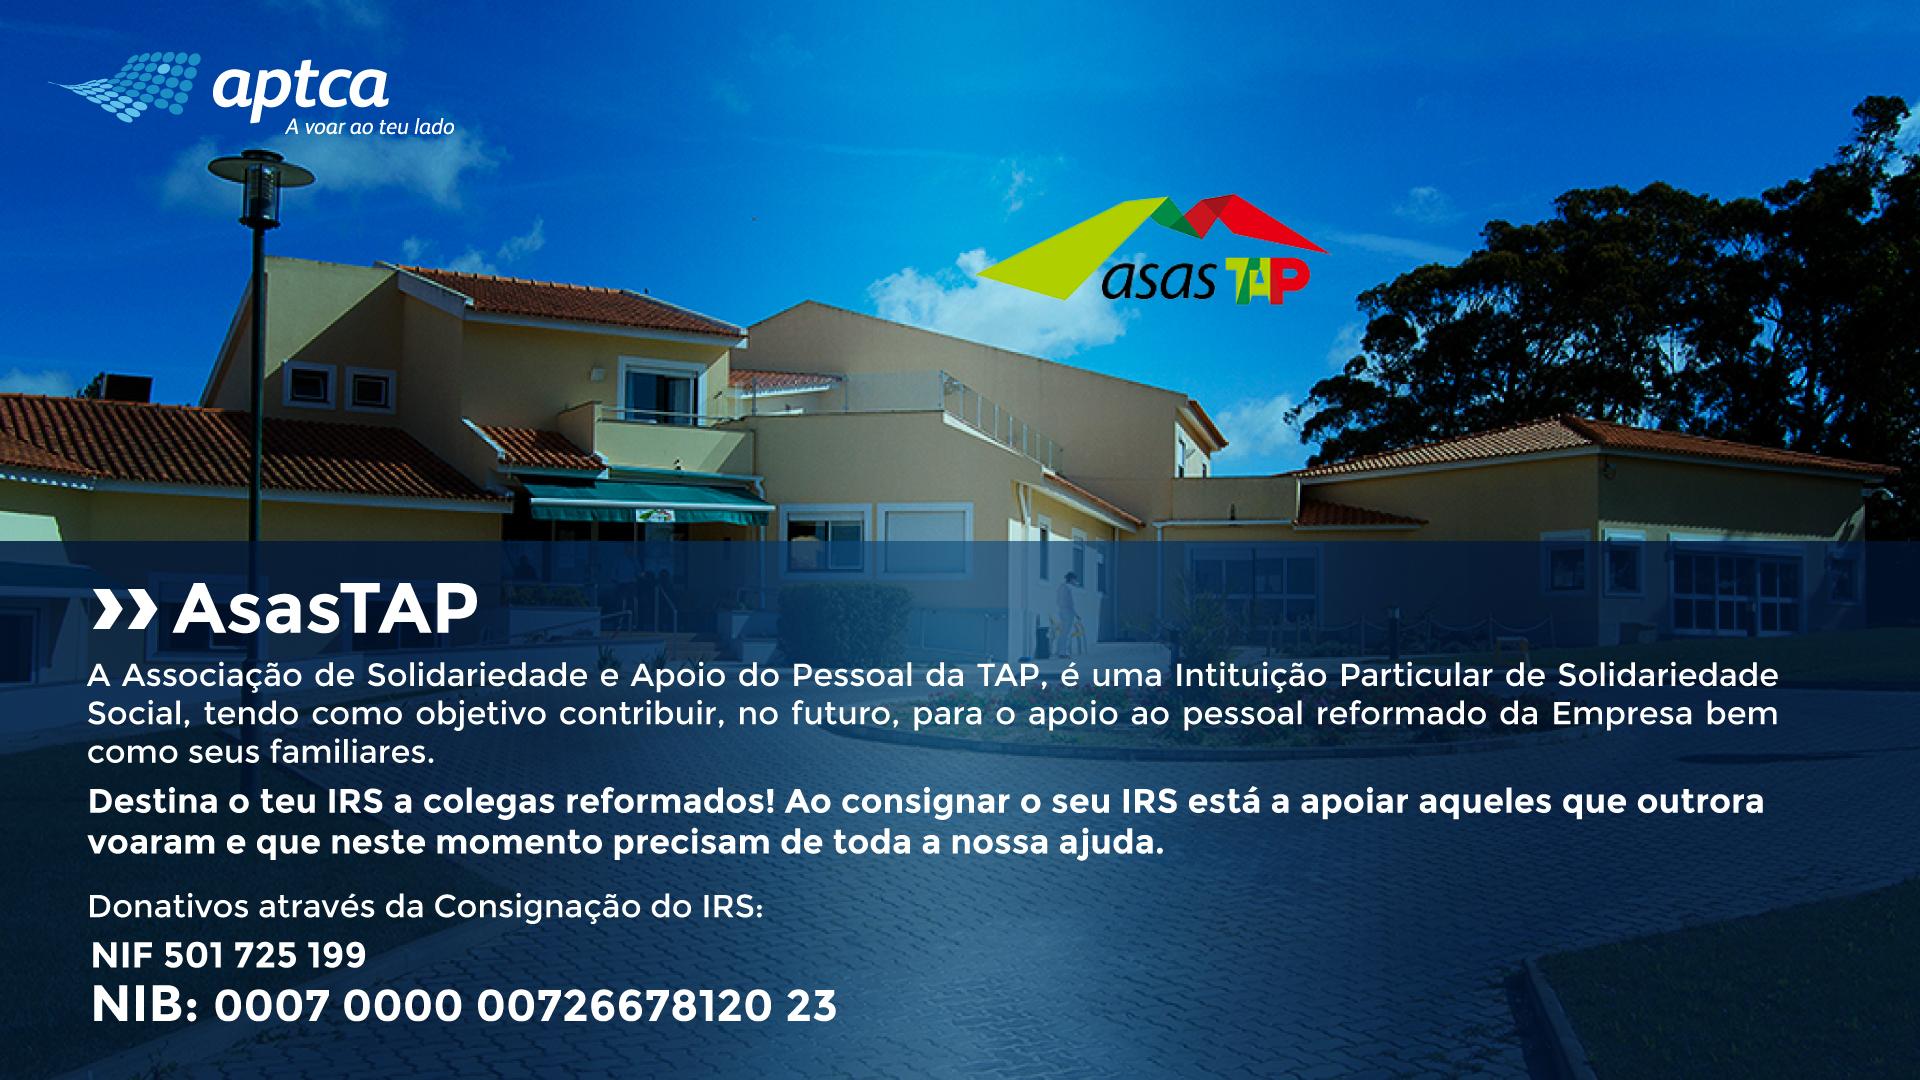 IMG_ASASTAP_1920x1080